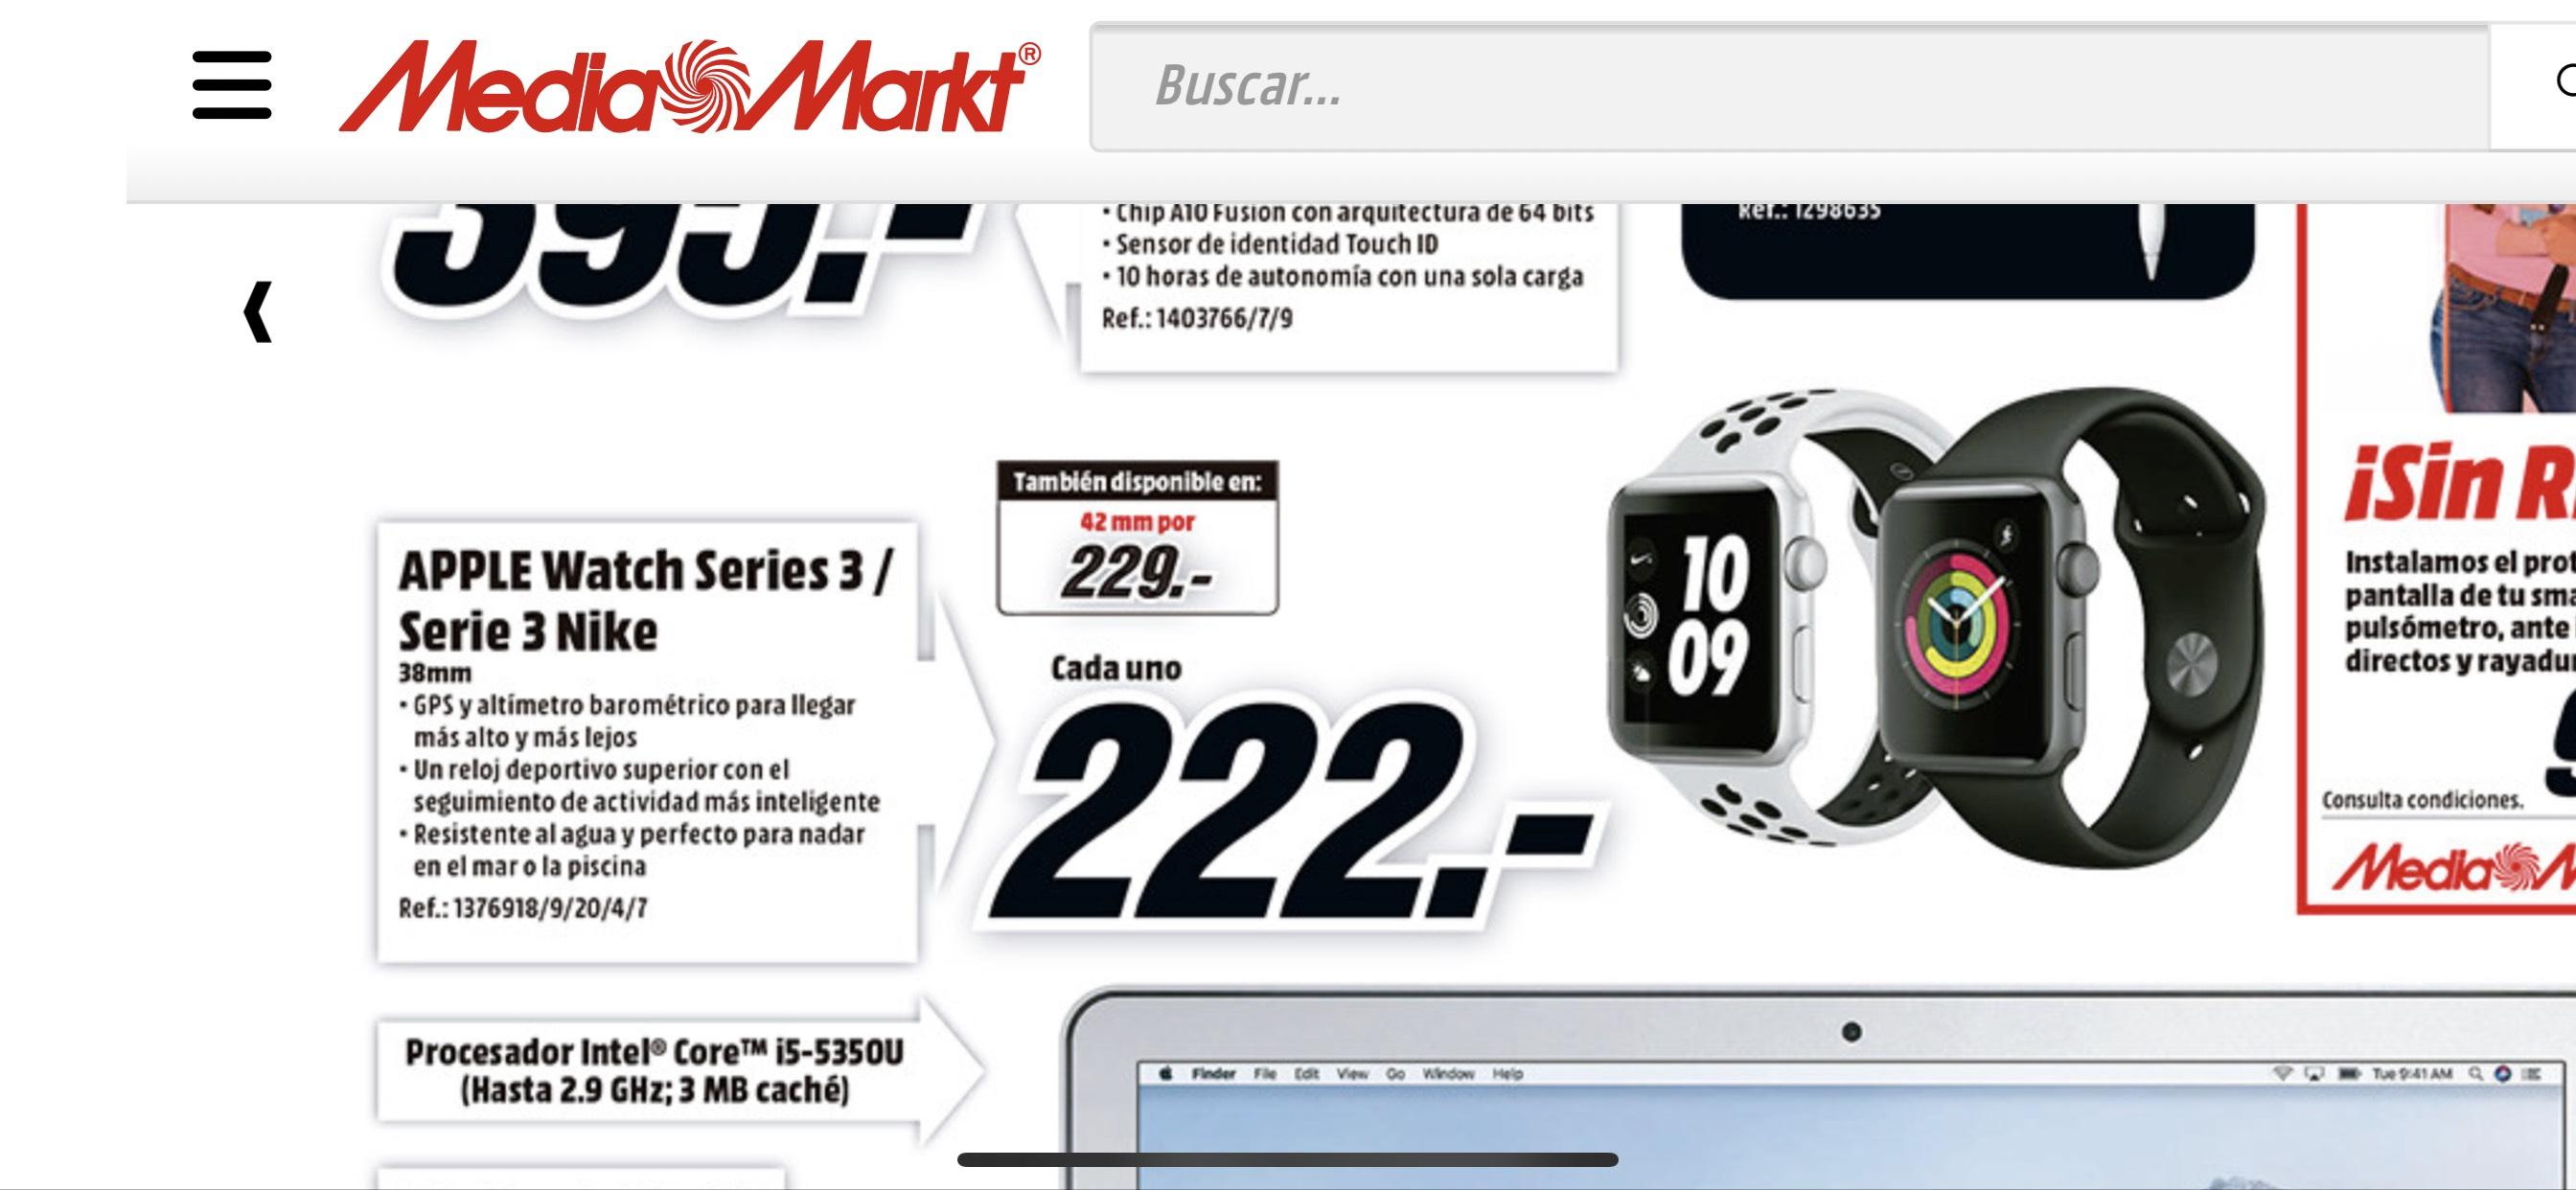 Apple Watch Series 3 [MediaMarkt] - chollometro.com